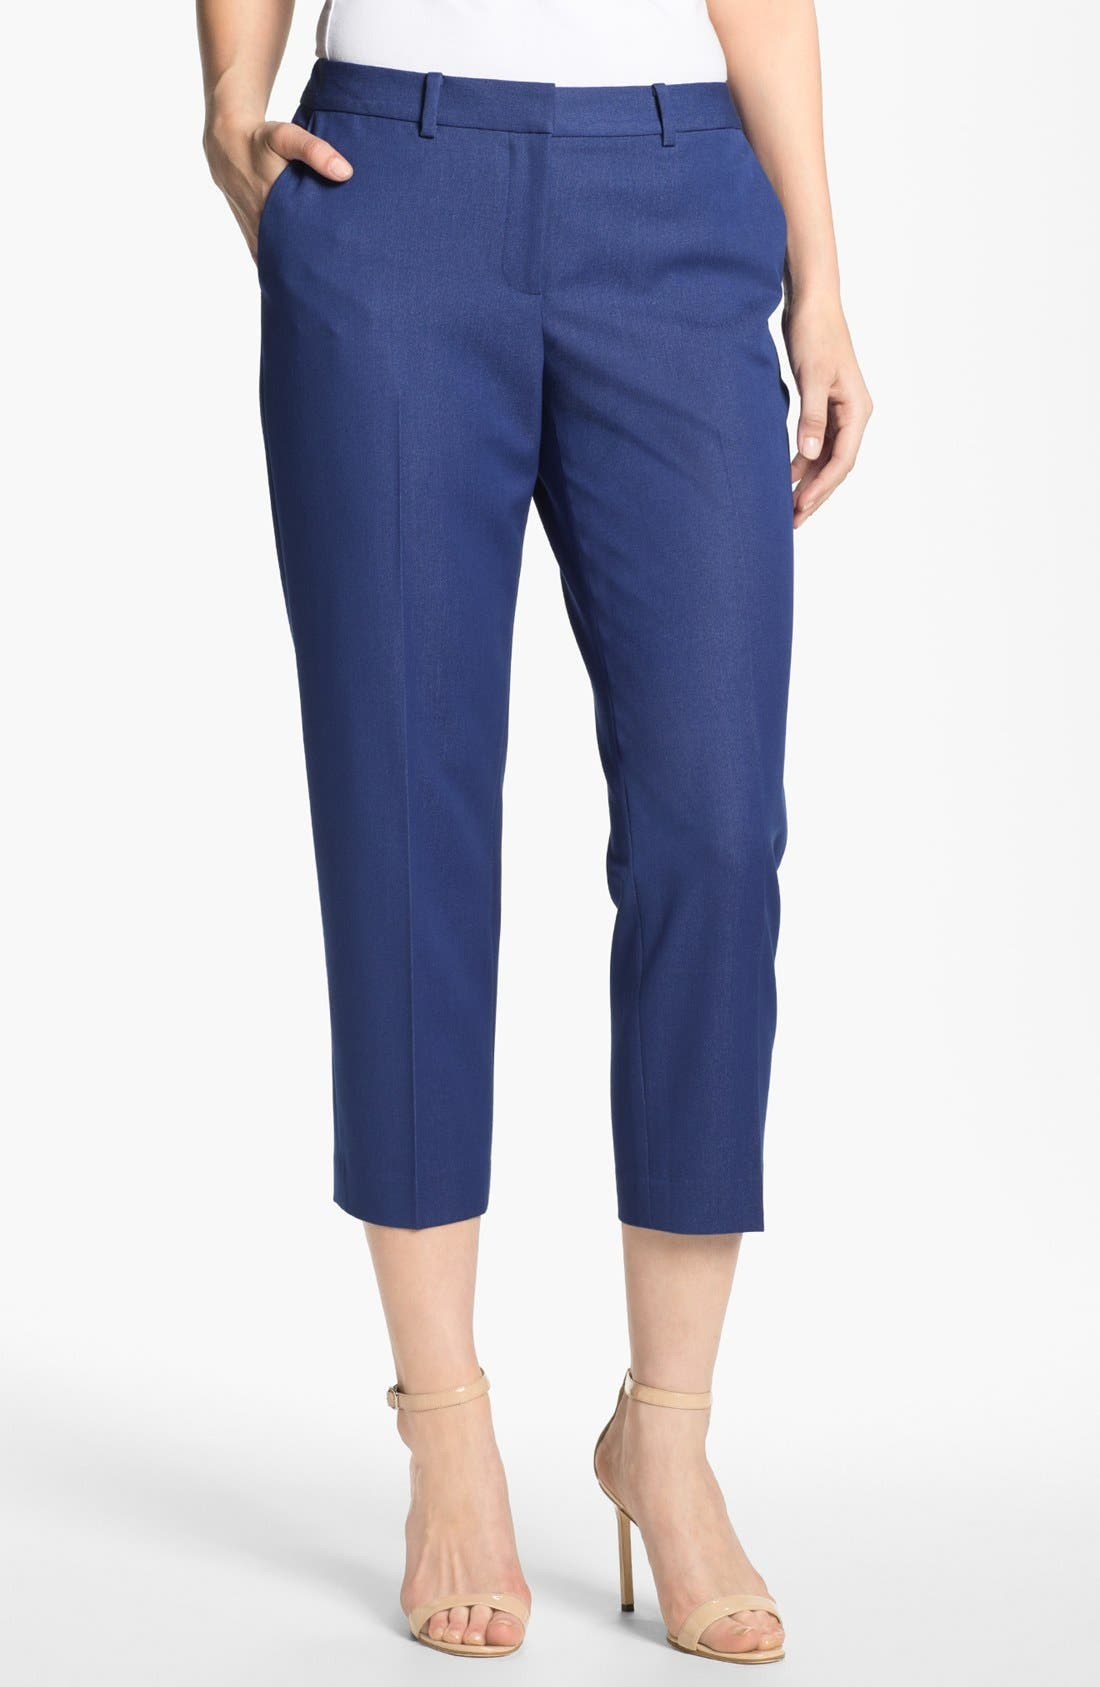 Main Image - T Tahari 'Cabana' Crop Pants (Petite) (Online Only)